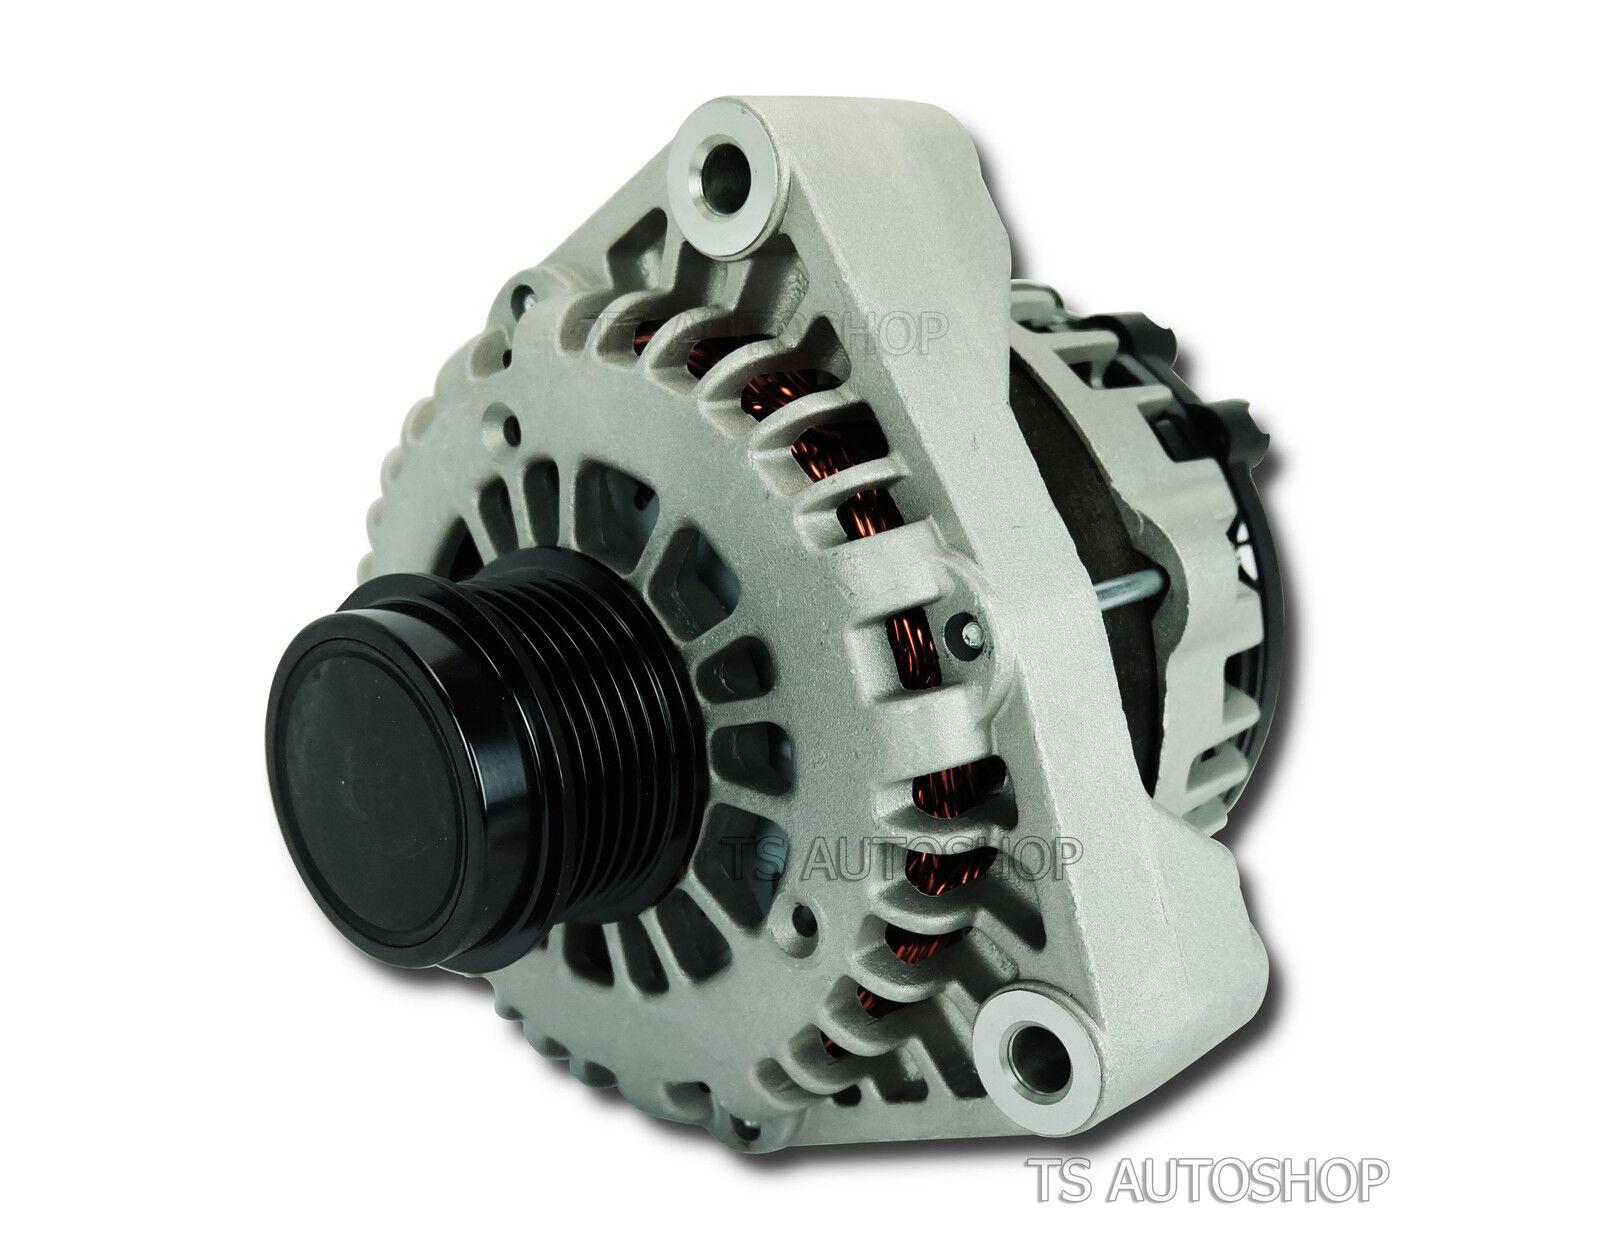 For Chevrolet Trailblazer 2012 2016 Alternator Generator 13593805 Blazer I Have A Powermaster Based On Oem Genuine Ebay